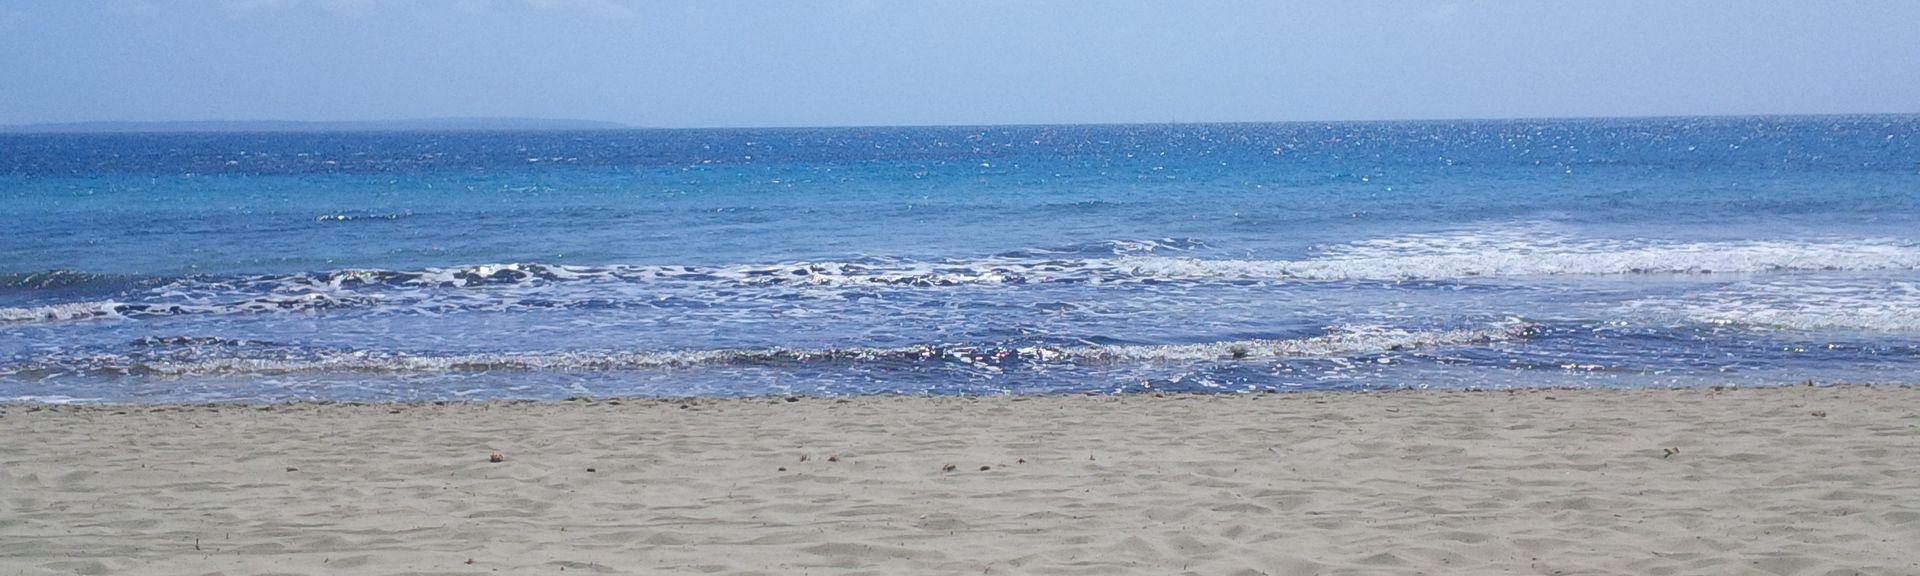 Santa Gertrudis, Islas Baleares, España